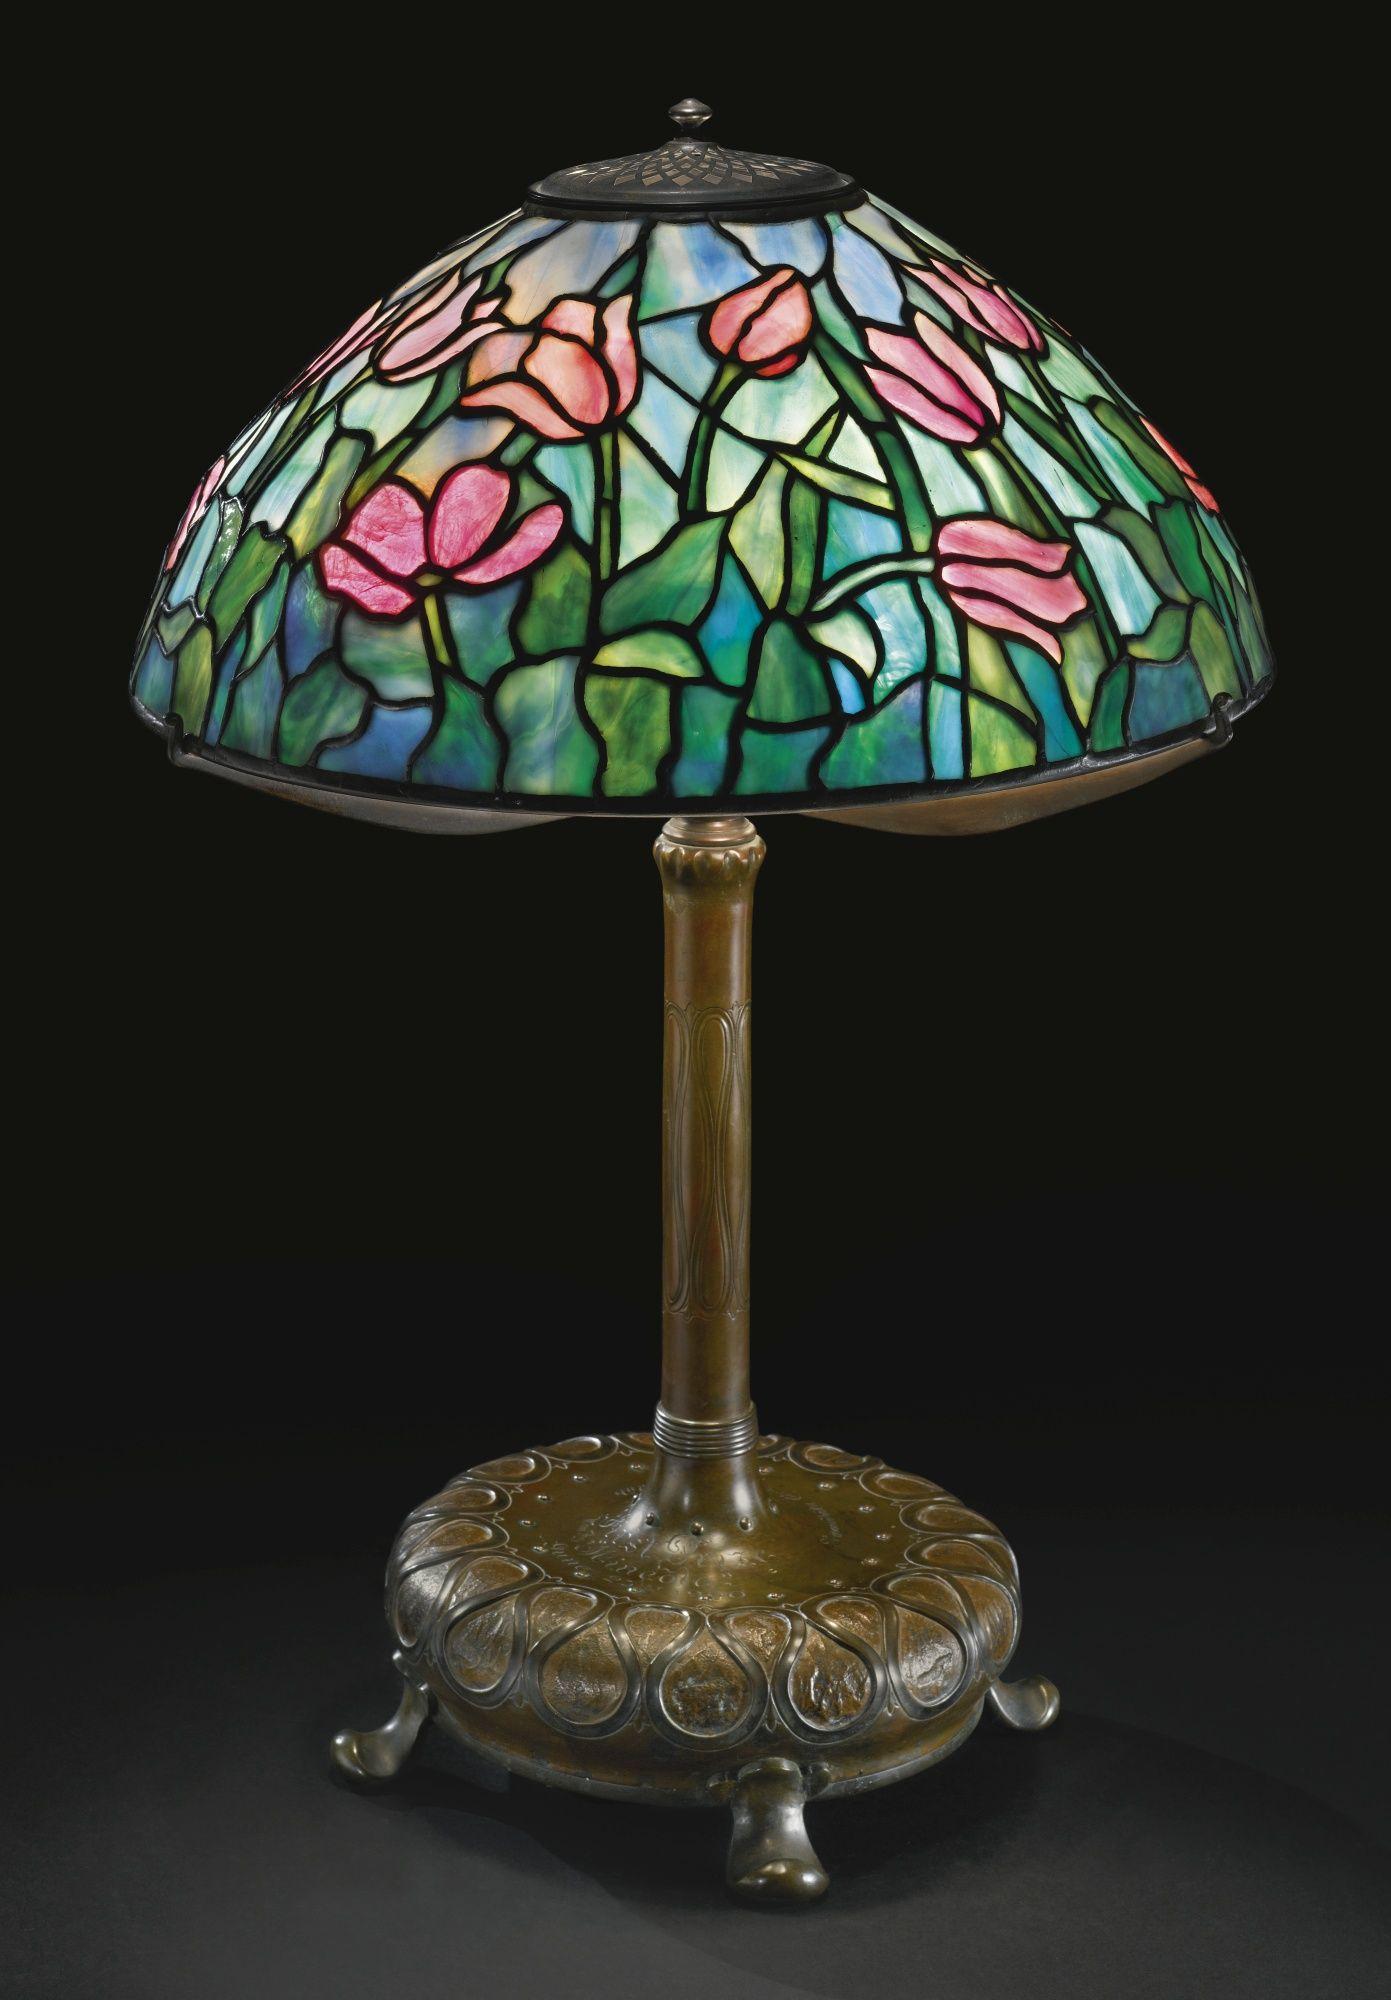 Tiffany Studios Tulip Table Lamp Shade Impressed Tiffany Studios